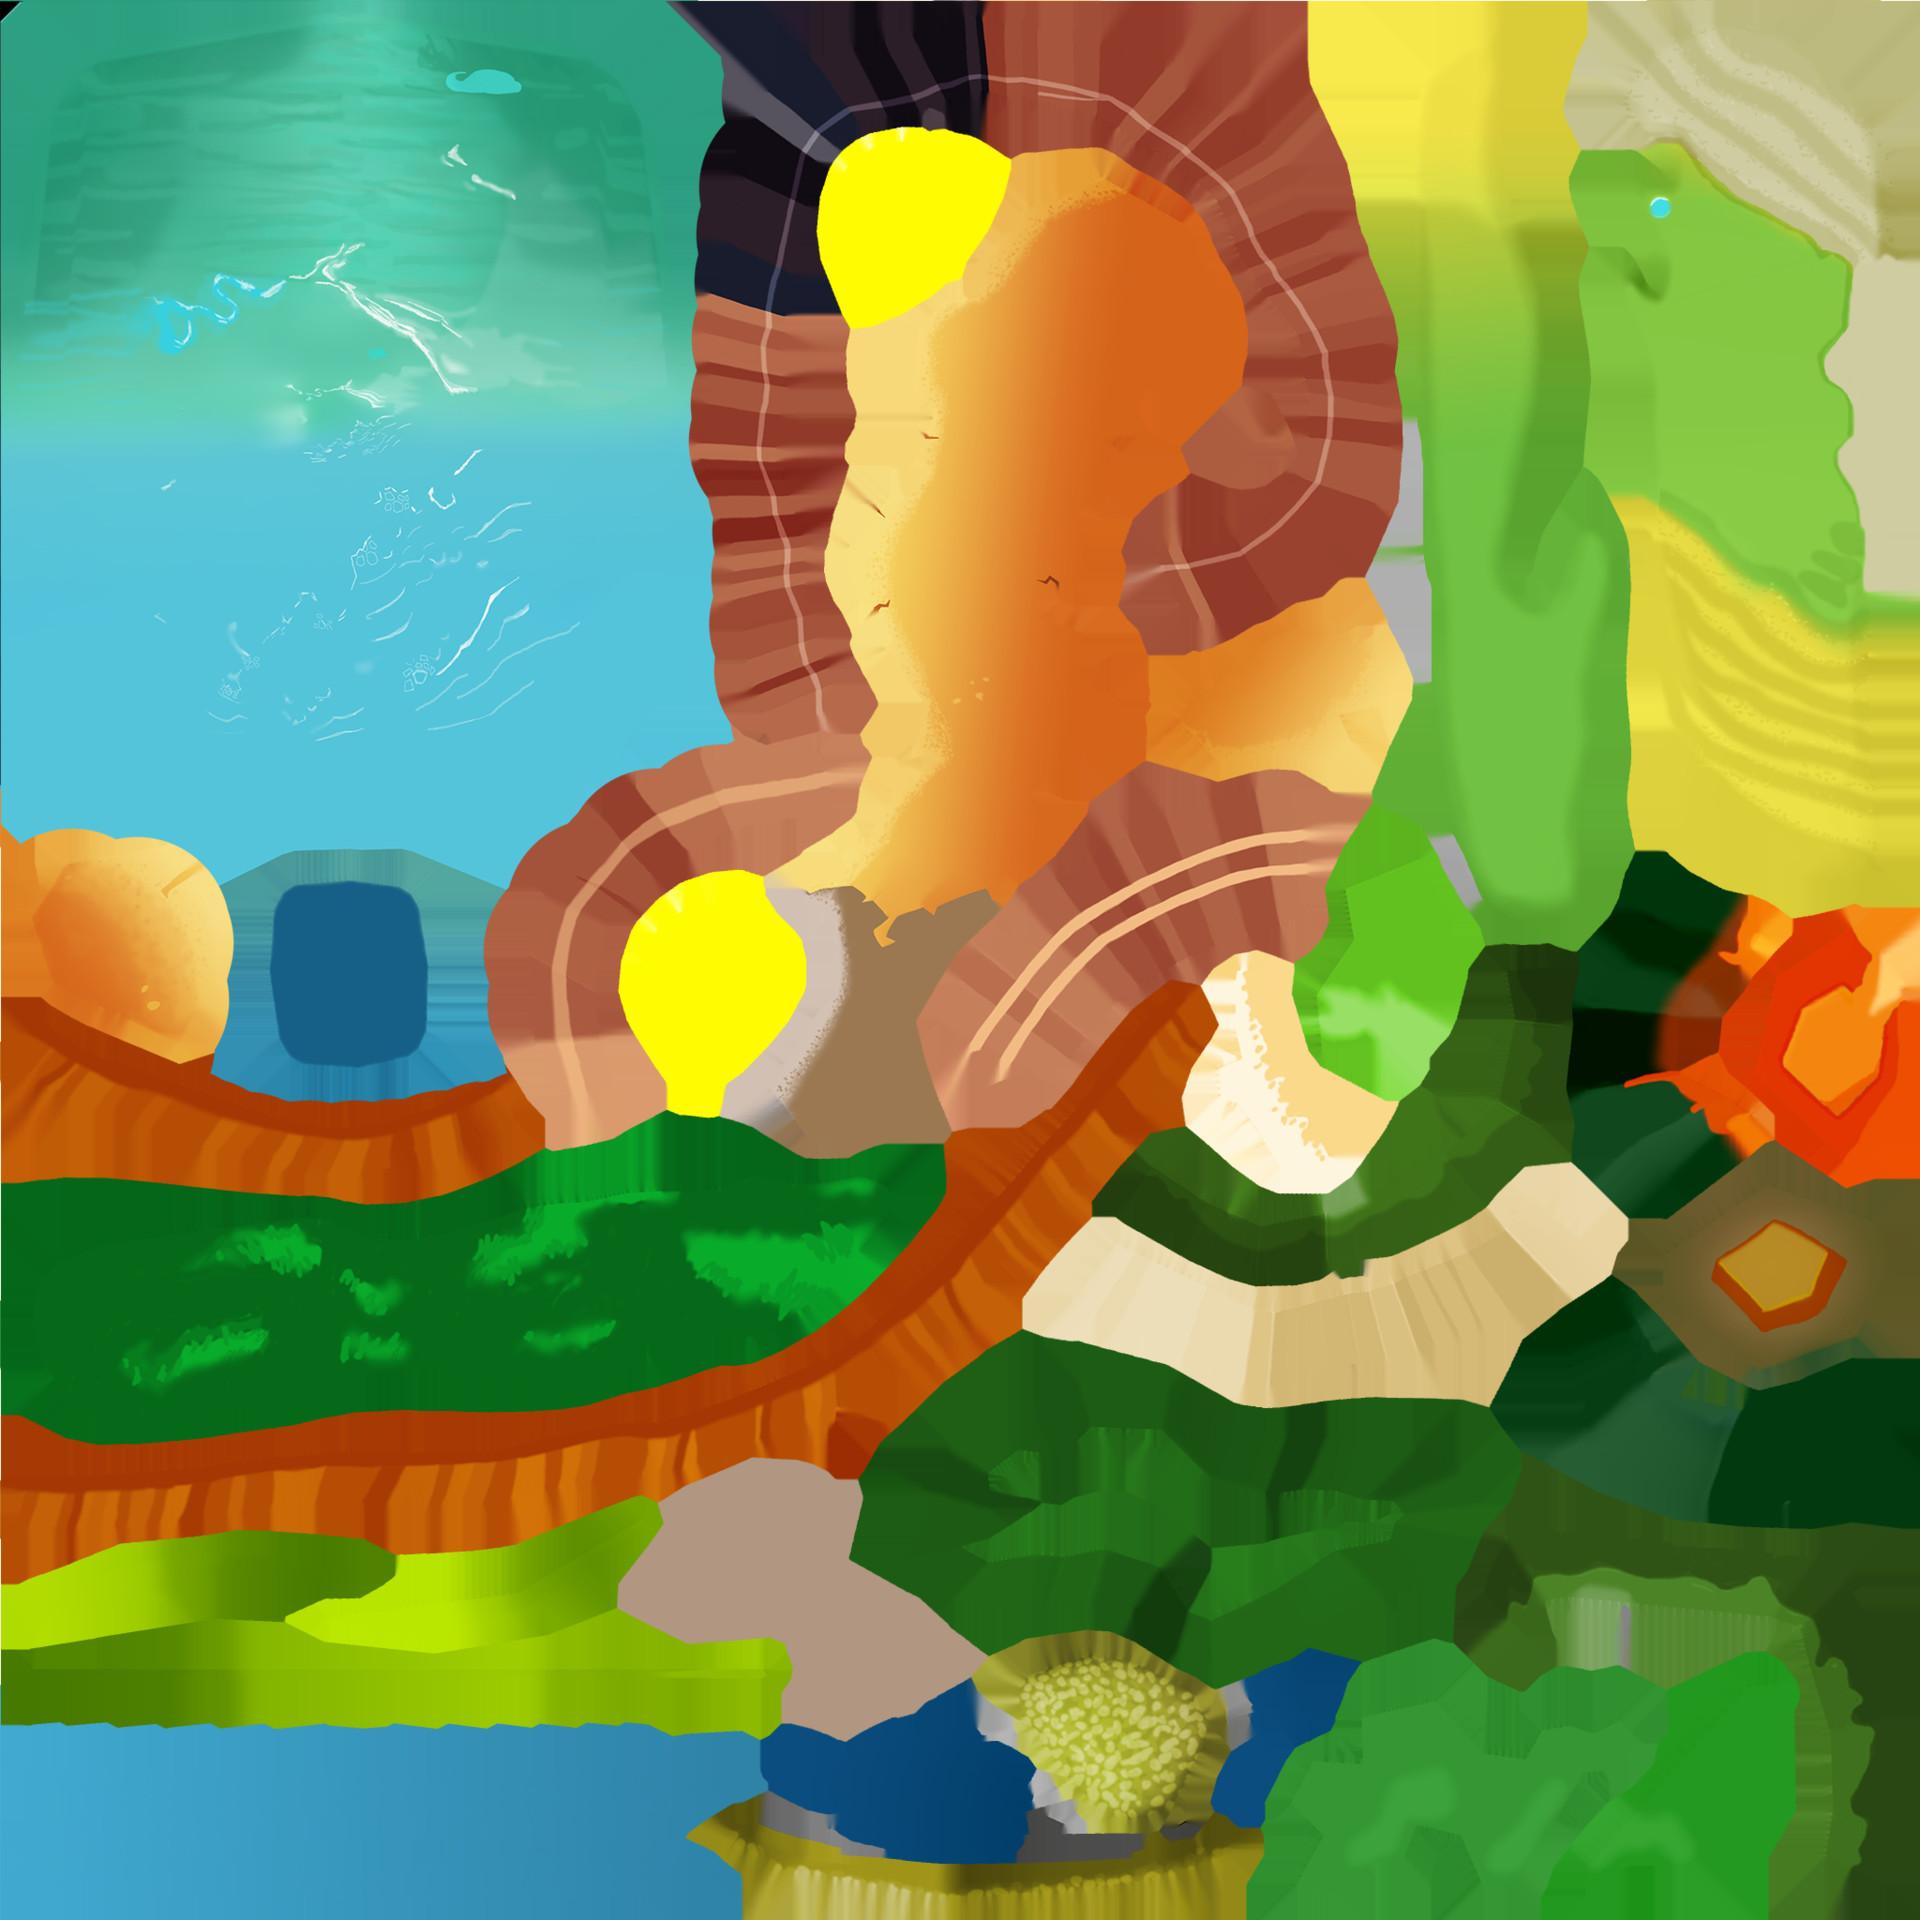 Antonio medina jamcity arttest antoniomedina texturemap